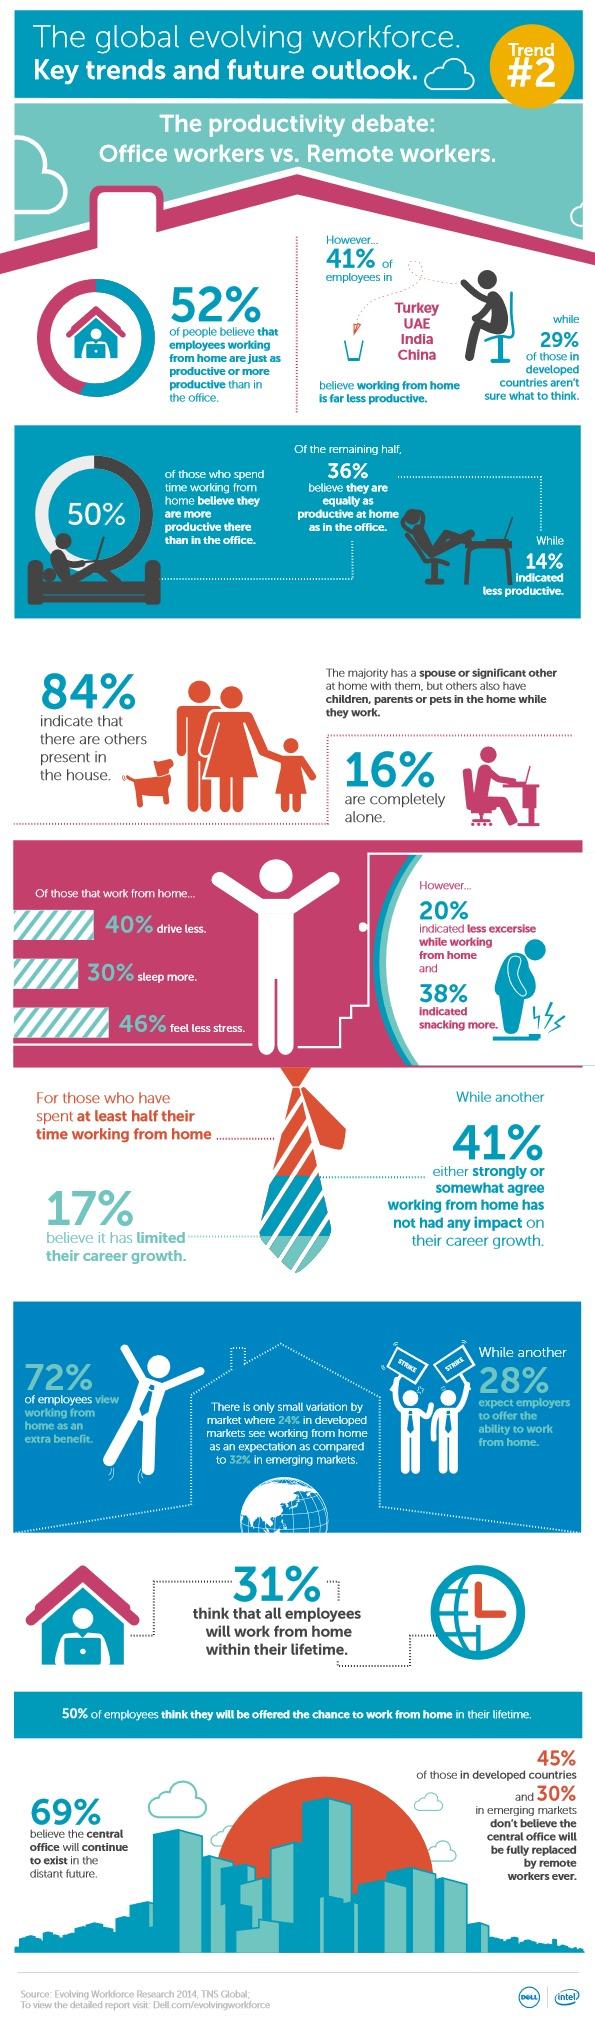 Global Evolving Workforce Infographic